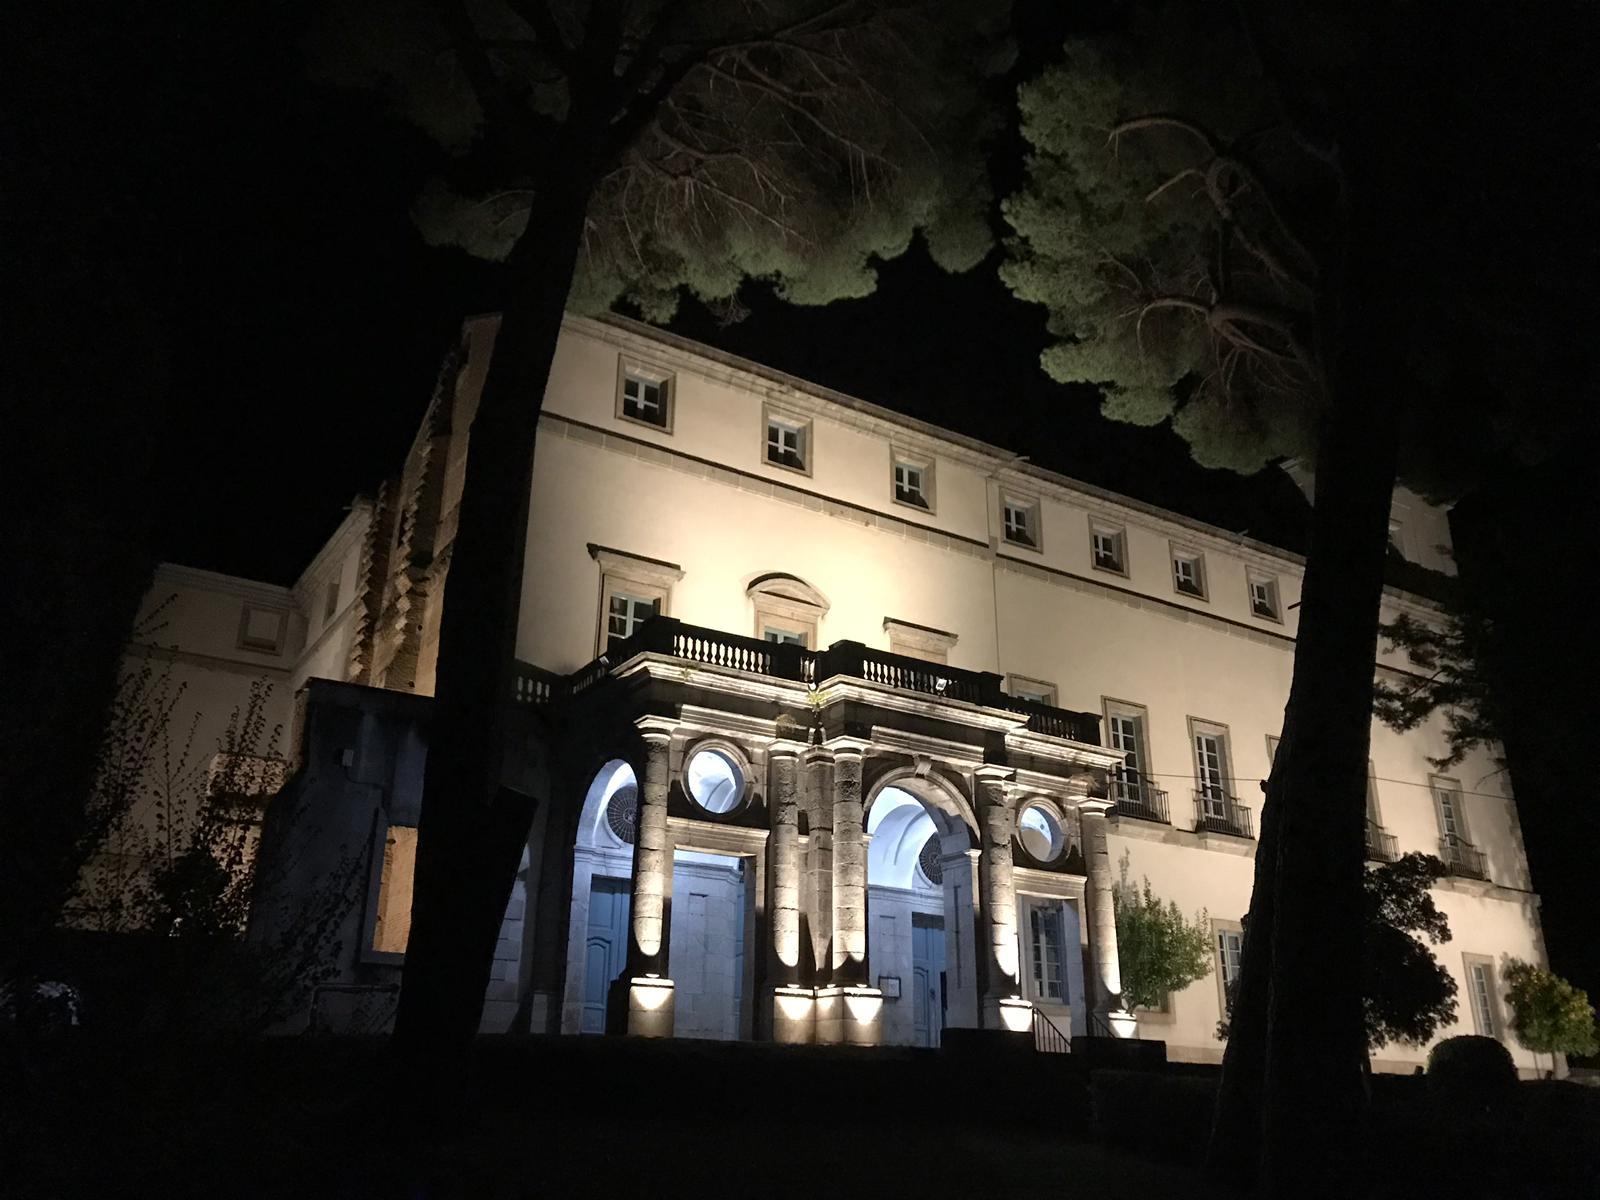 Palacio de La Mosquera iluminado - Arenas de San Pedro - TiétarTeVe